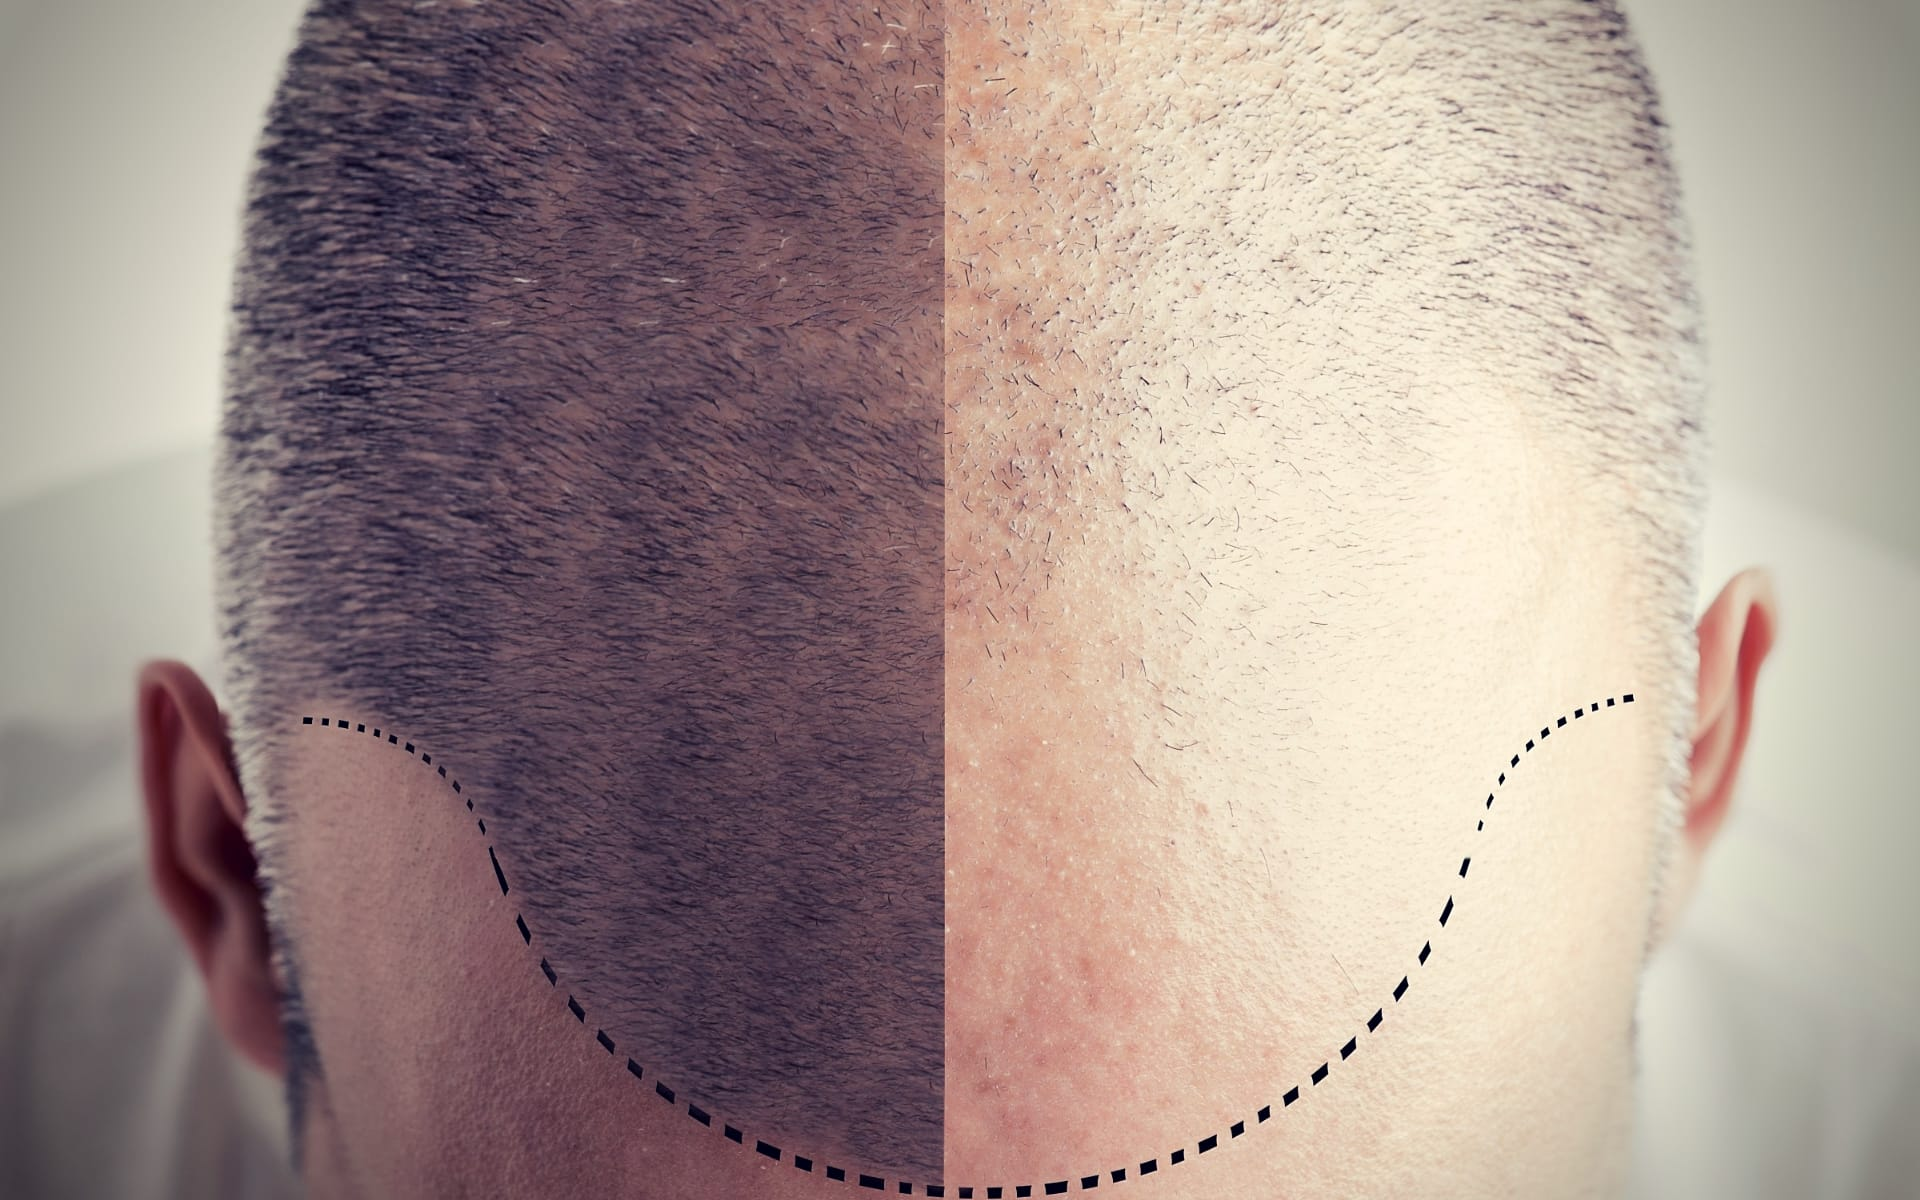 Minoxidil Shampoo Reviews Hair Loss - Before and After